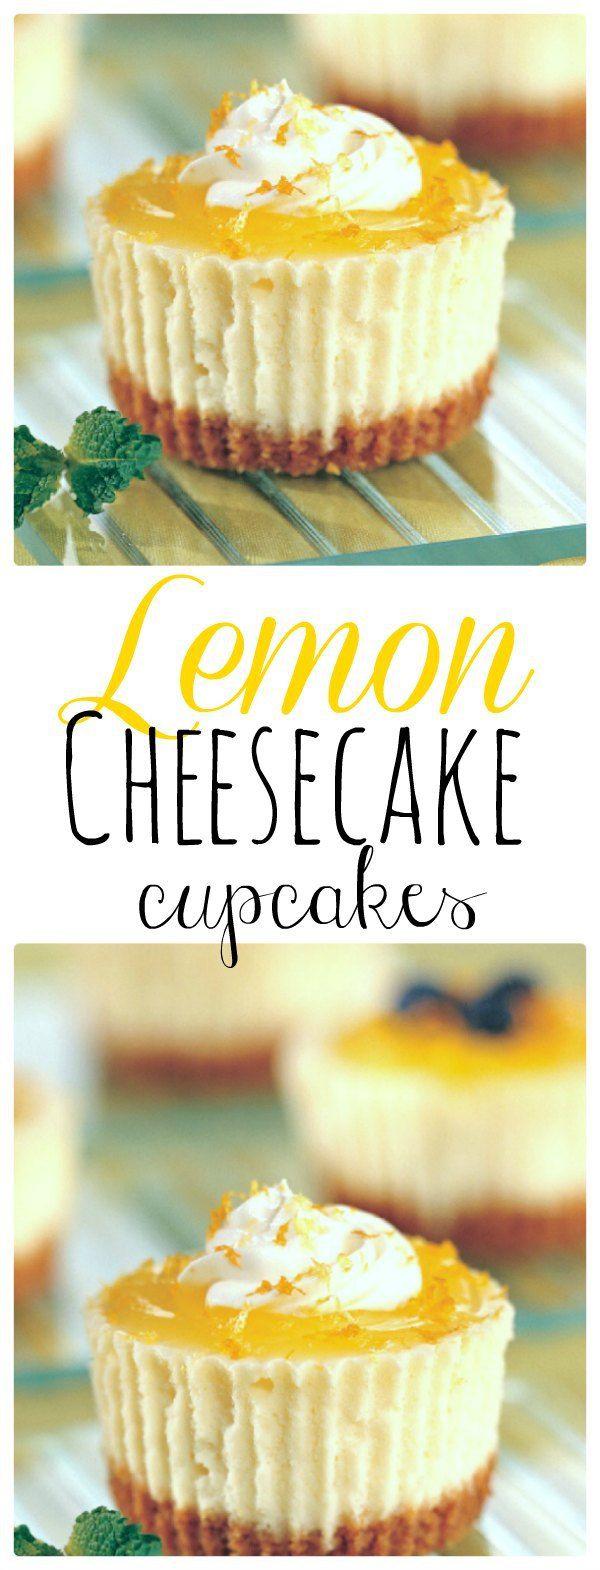 Mini Lemon Cheesecakes topped with lemon curd. Simple Dessert Recipe. The Flying Couponer | Family. Travel. Saving Money.